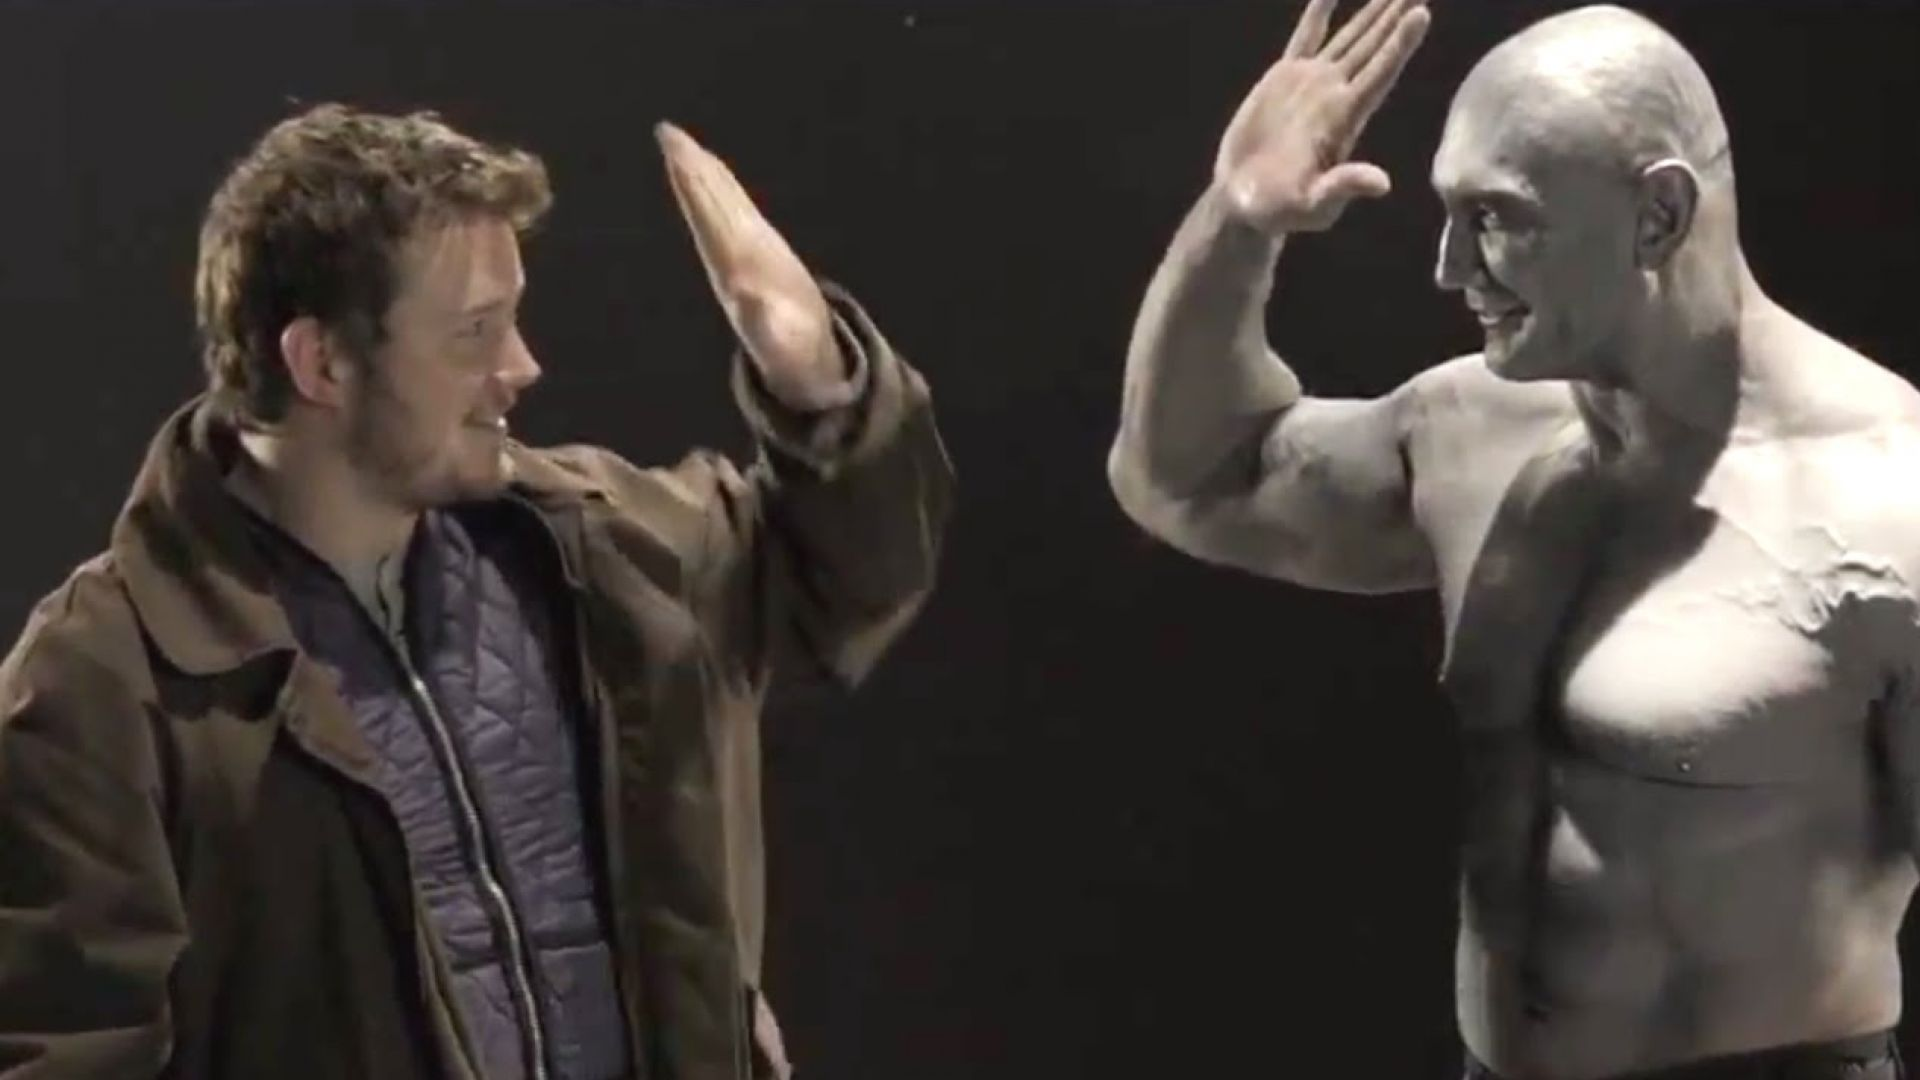 Guardians Of The Galaxy Screen Test Clip Chris Pratt And Dav